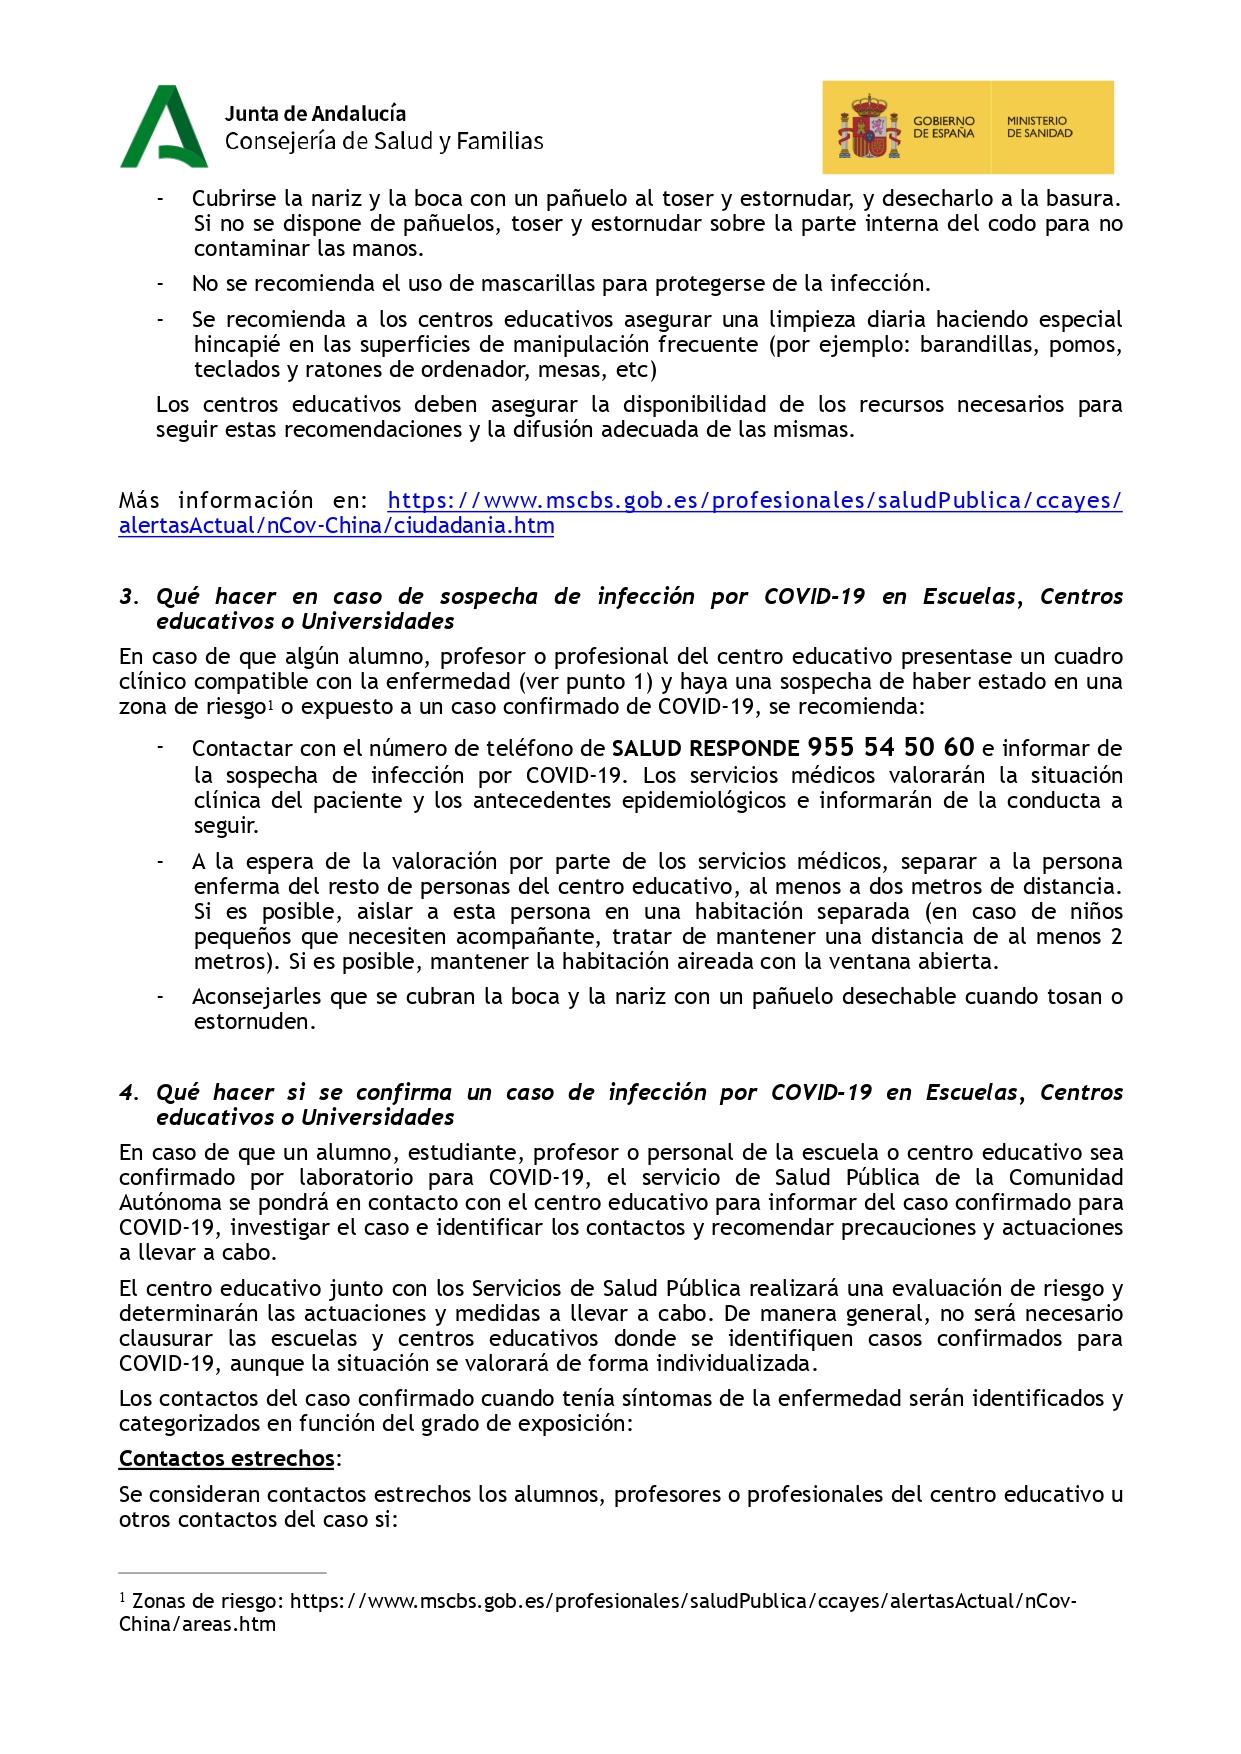 GuiaCentrosEducativosANDALUCIA_page-0002